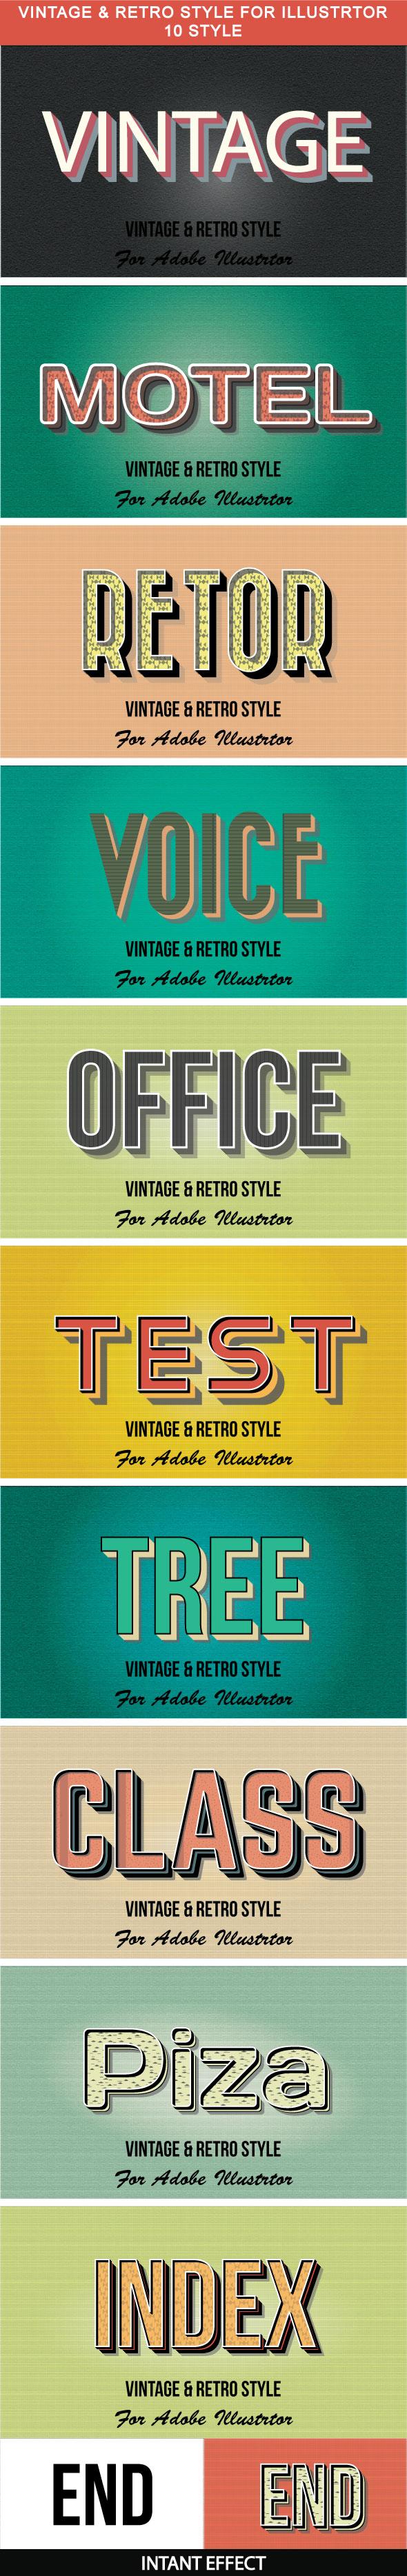 10_Vintage & Retro Style - Styles Illustrator